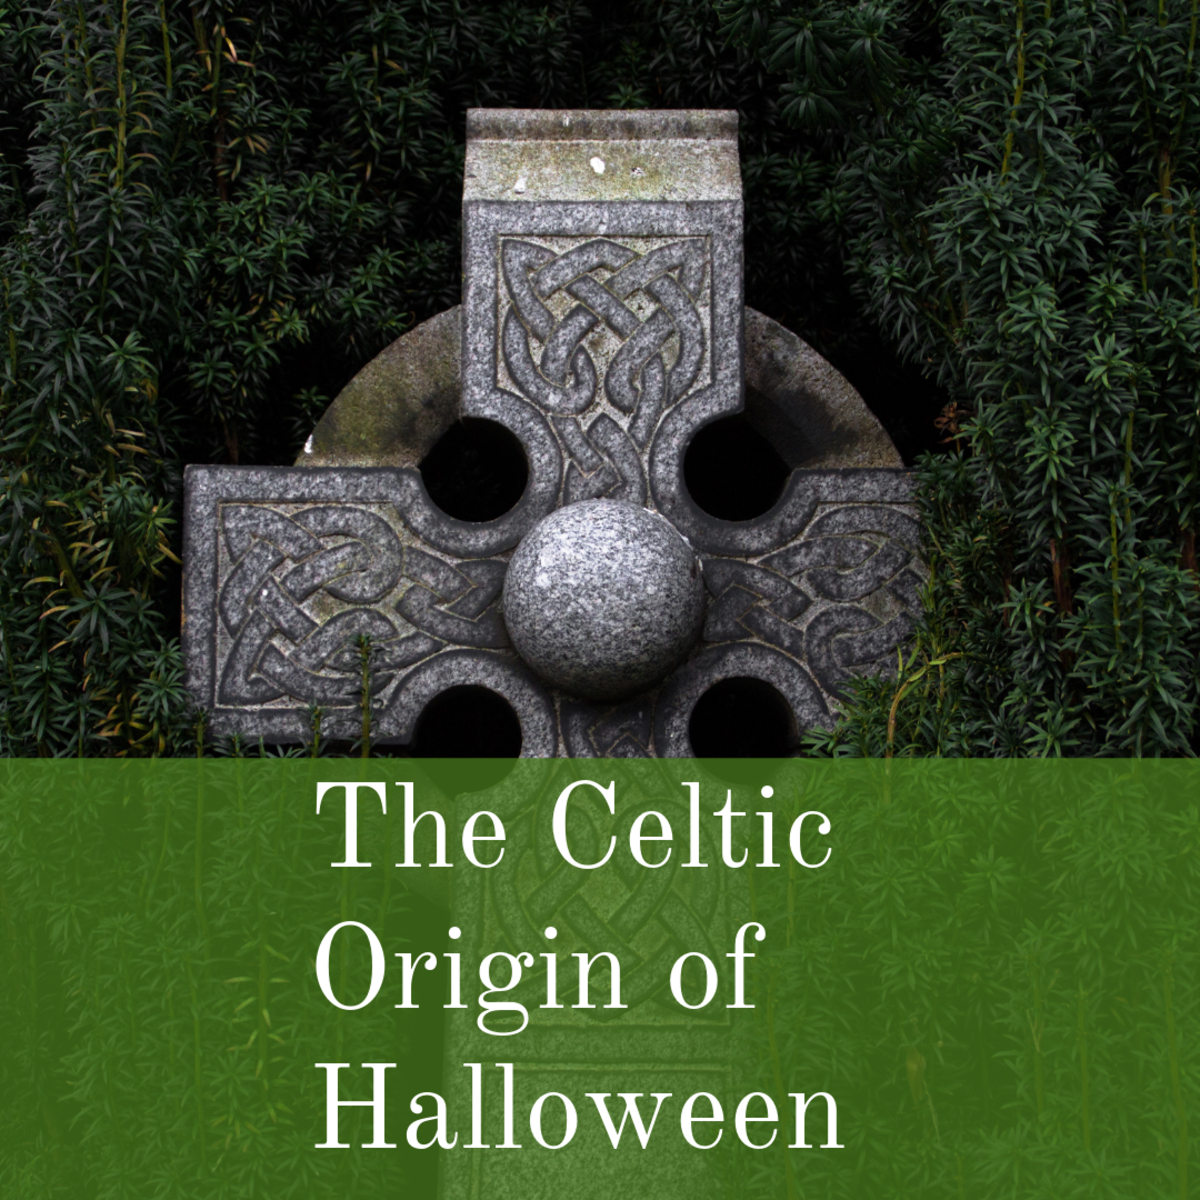 Learn the Celtic origins of Halloween.